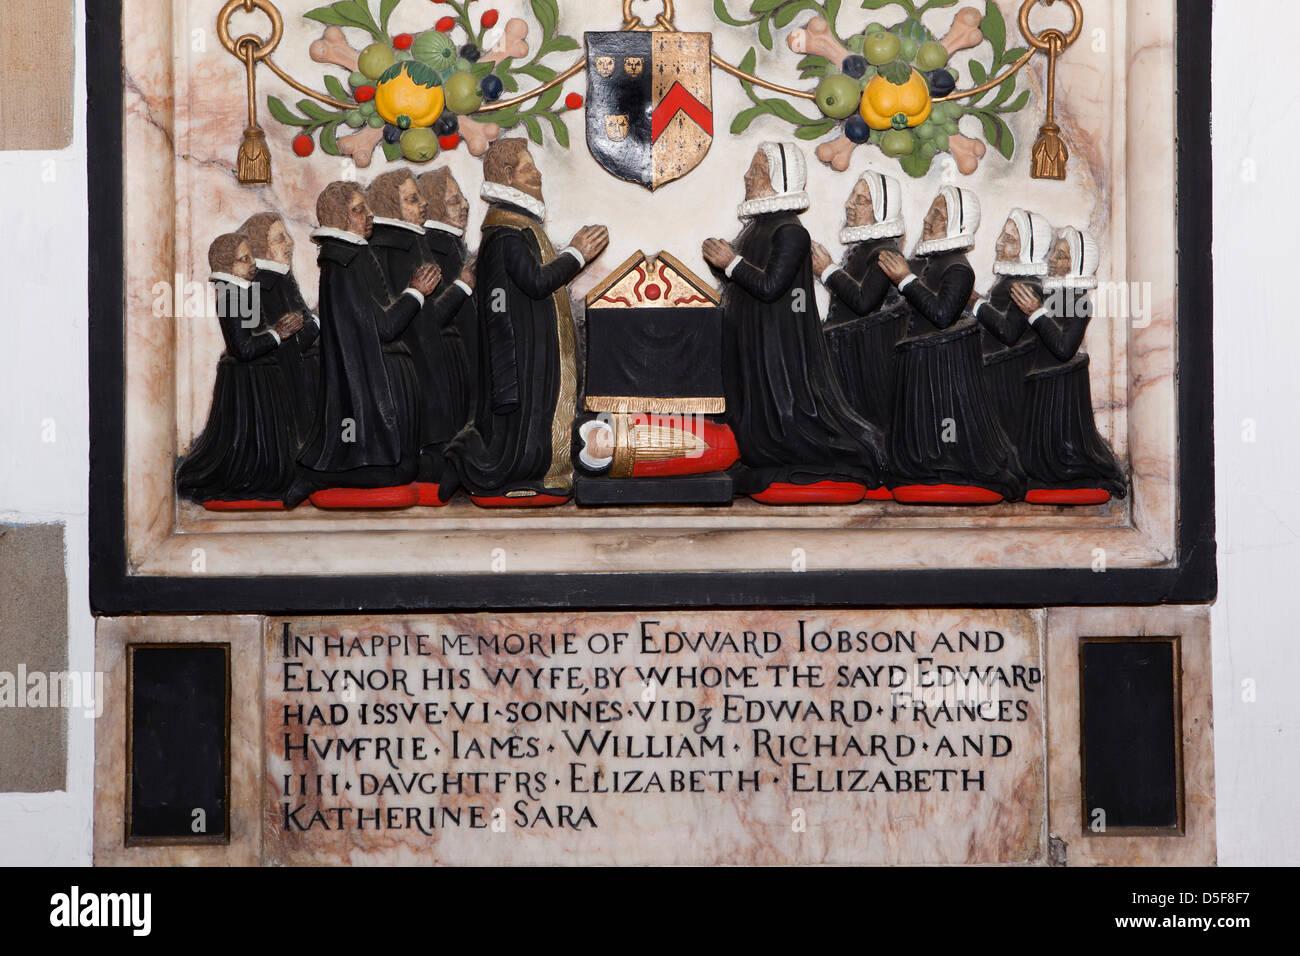 England, Berkshire, Windsor, parish church of St John the Baptist, Edward Jobson memorial - Stock Image